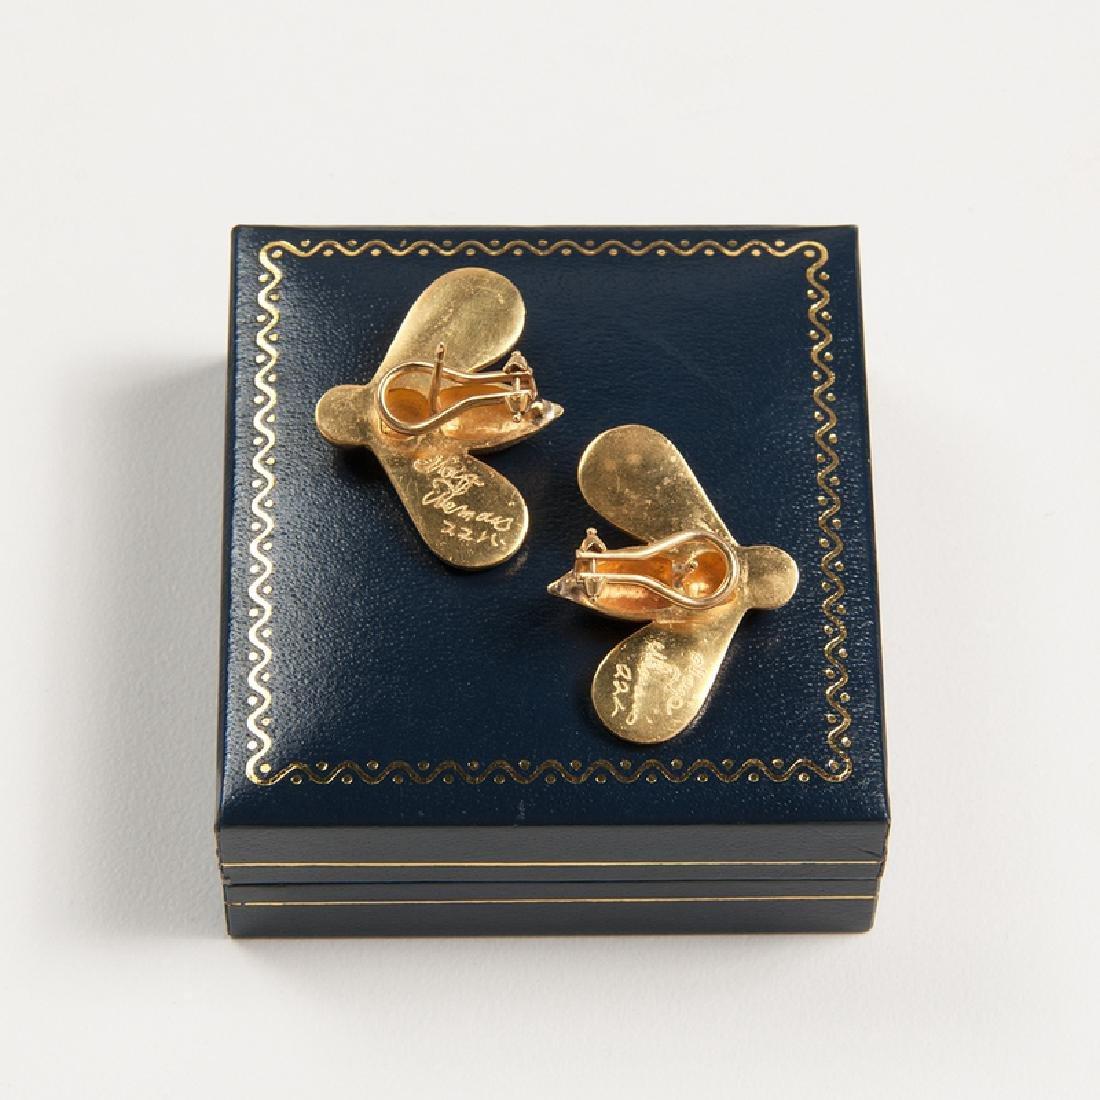 Maija Neimanis for Potter Mellen Bee Earrings - 3